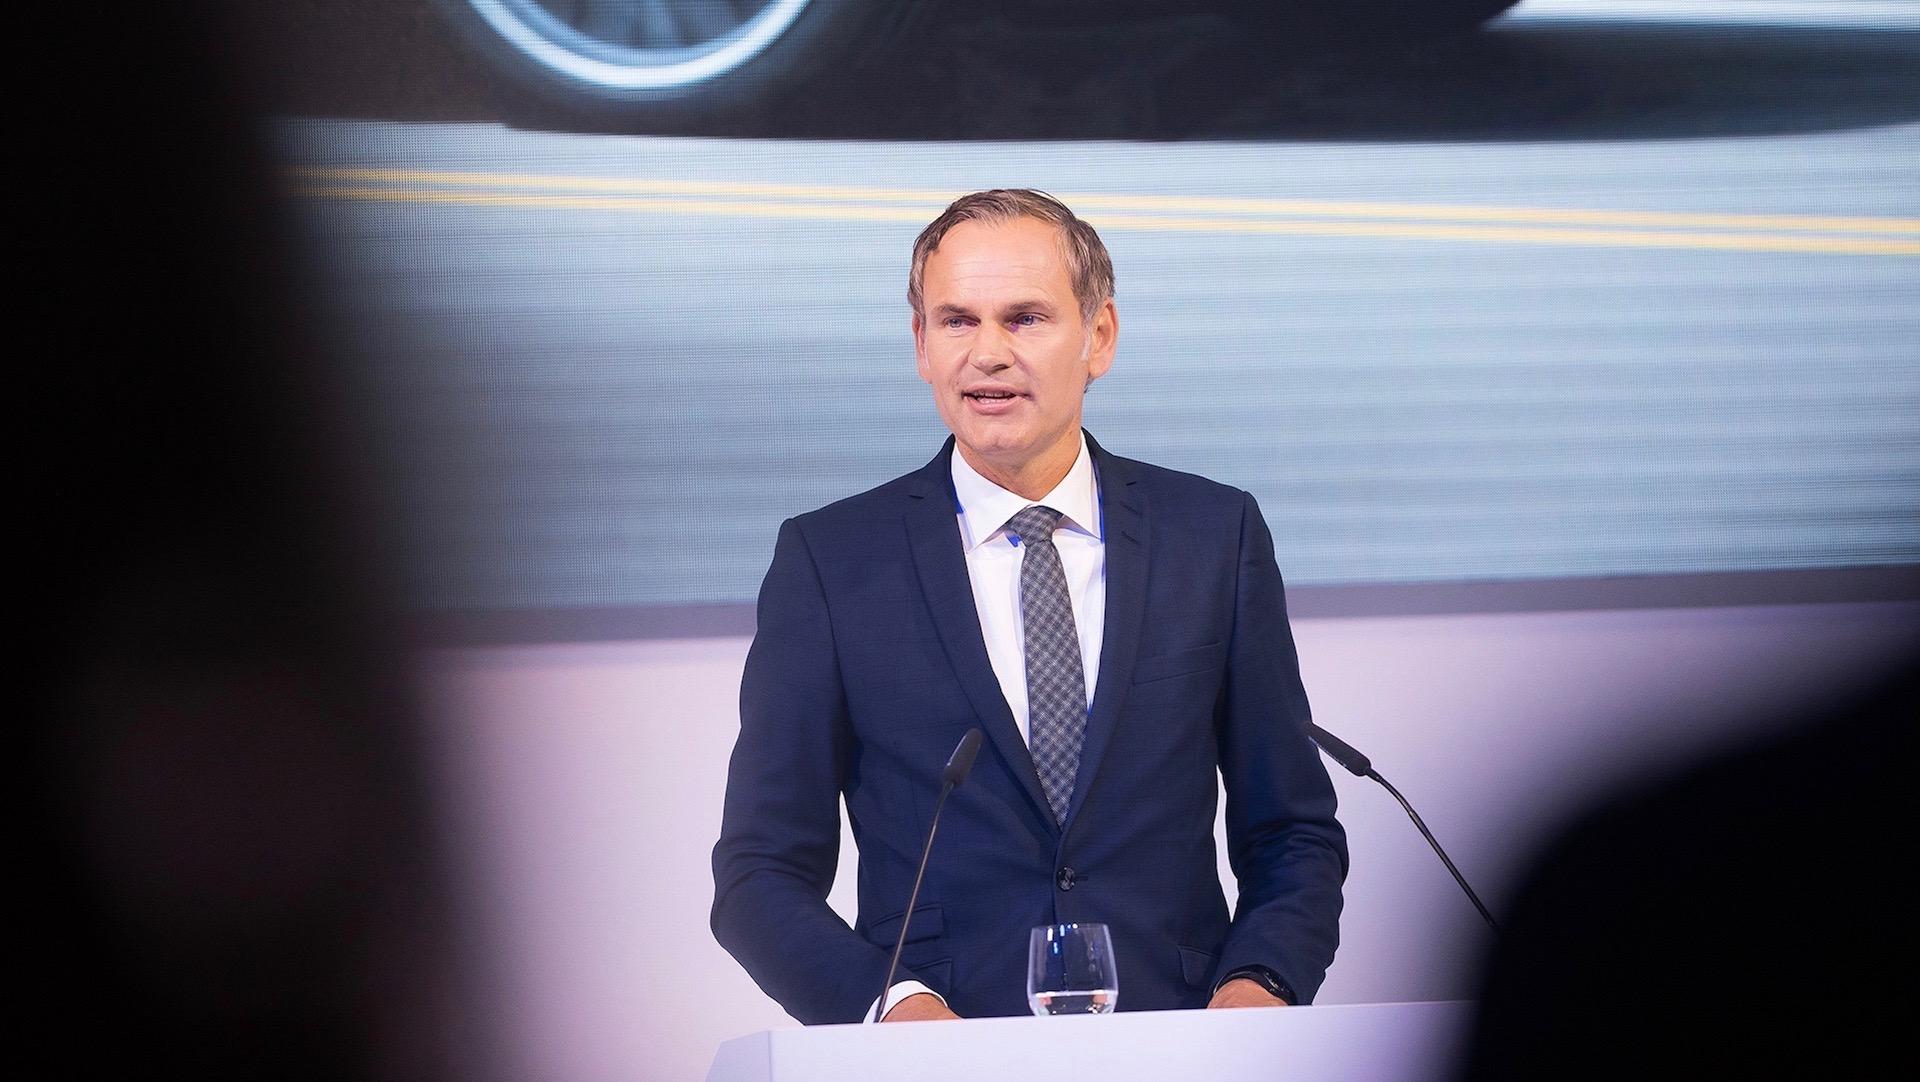 Šéf Porsche Oliver Blume